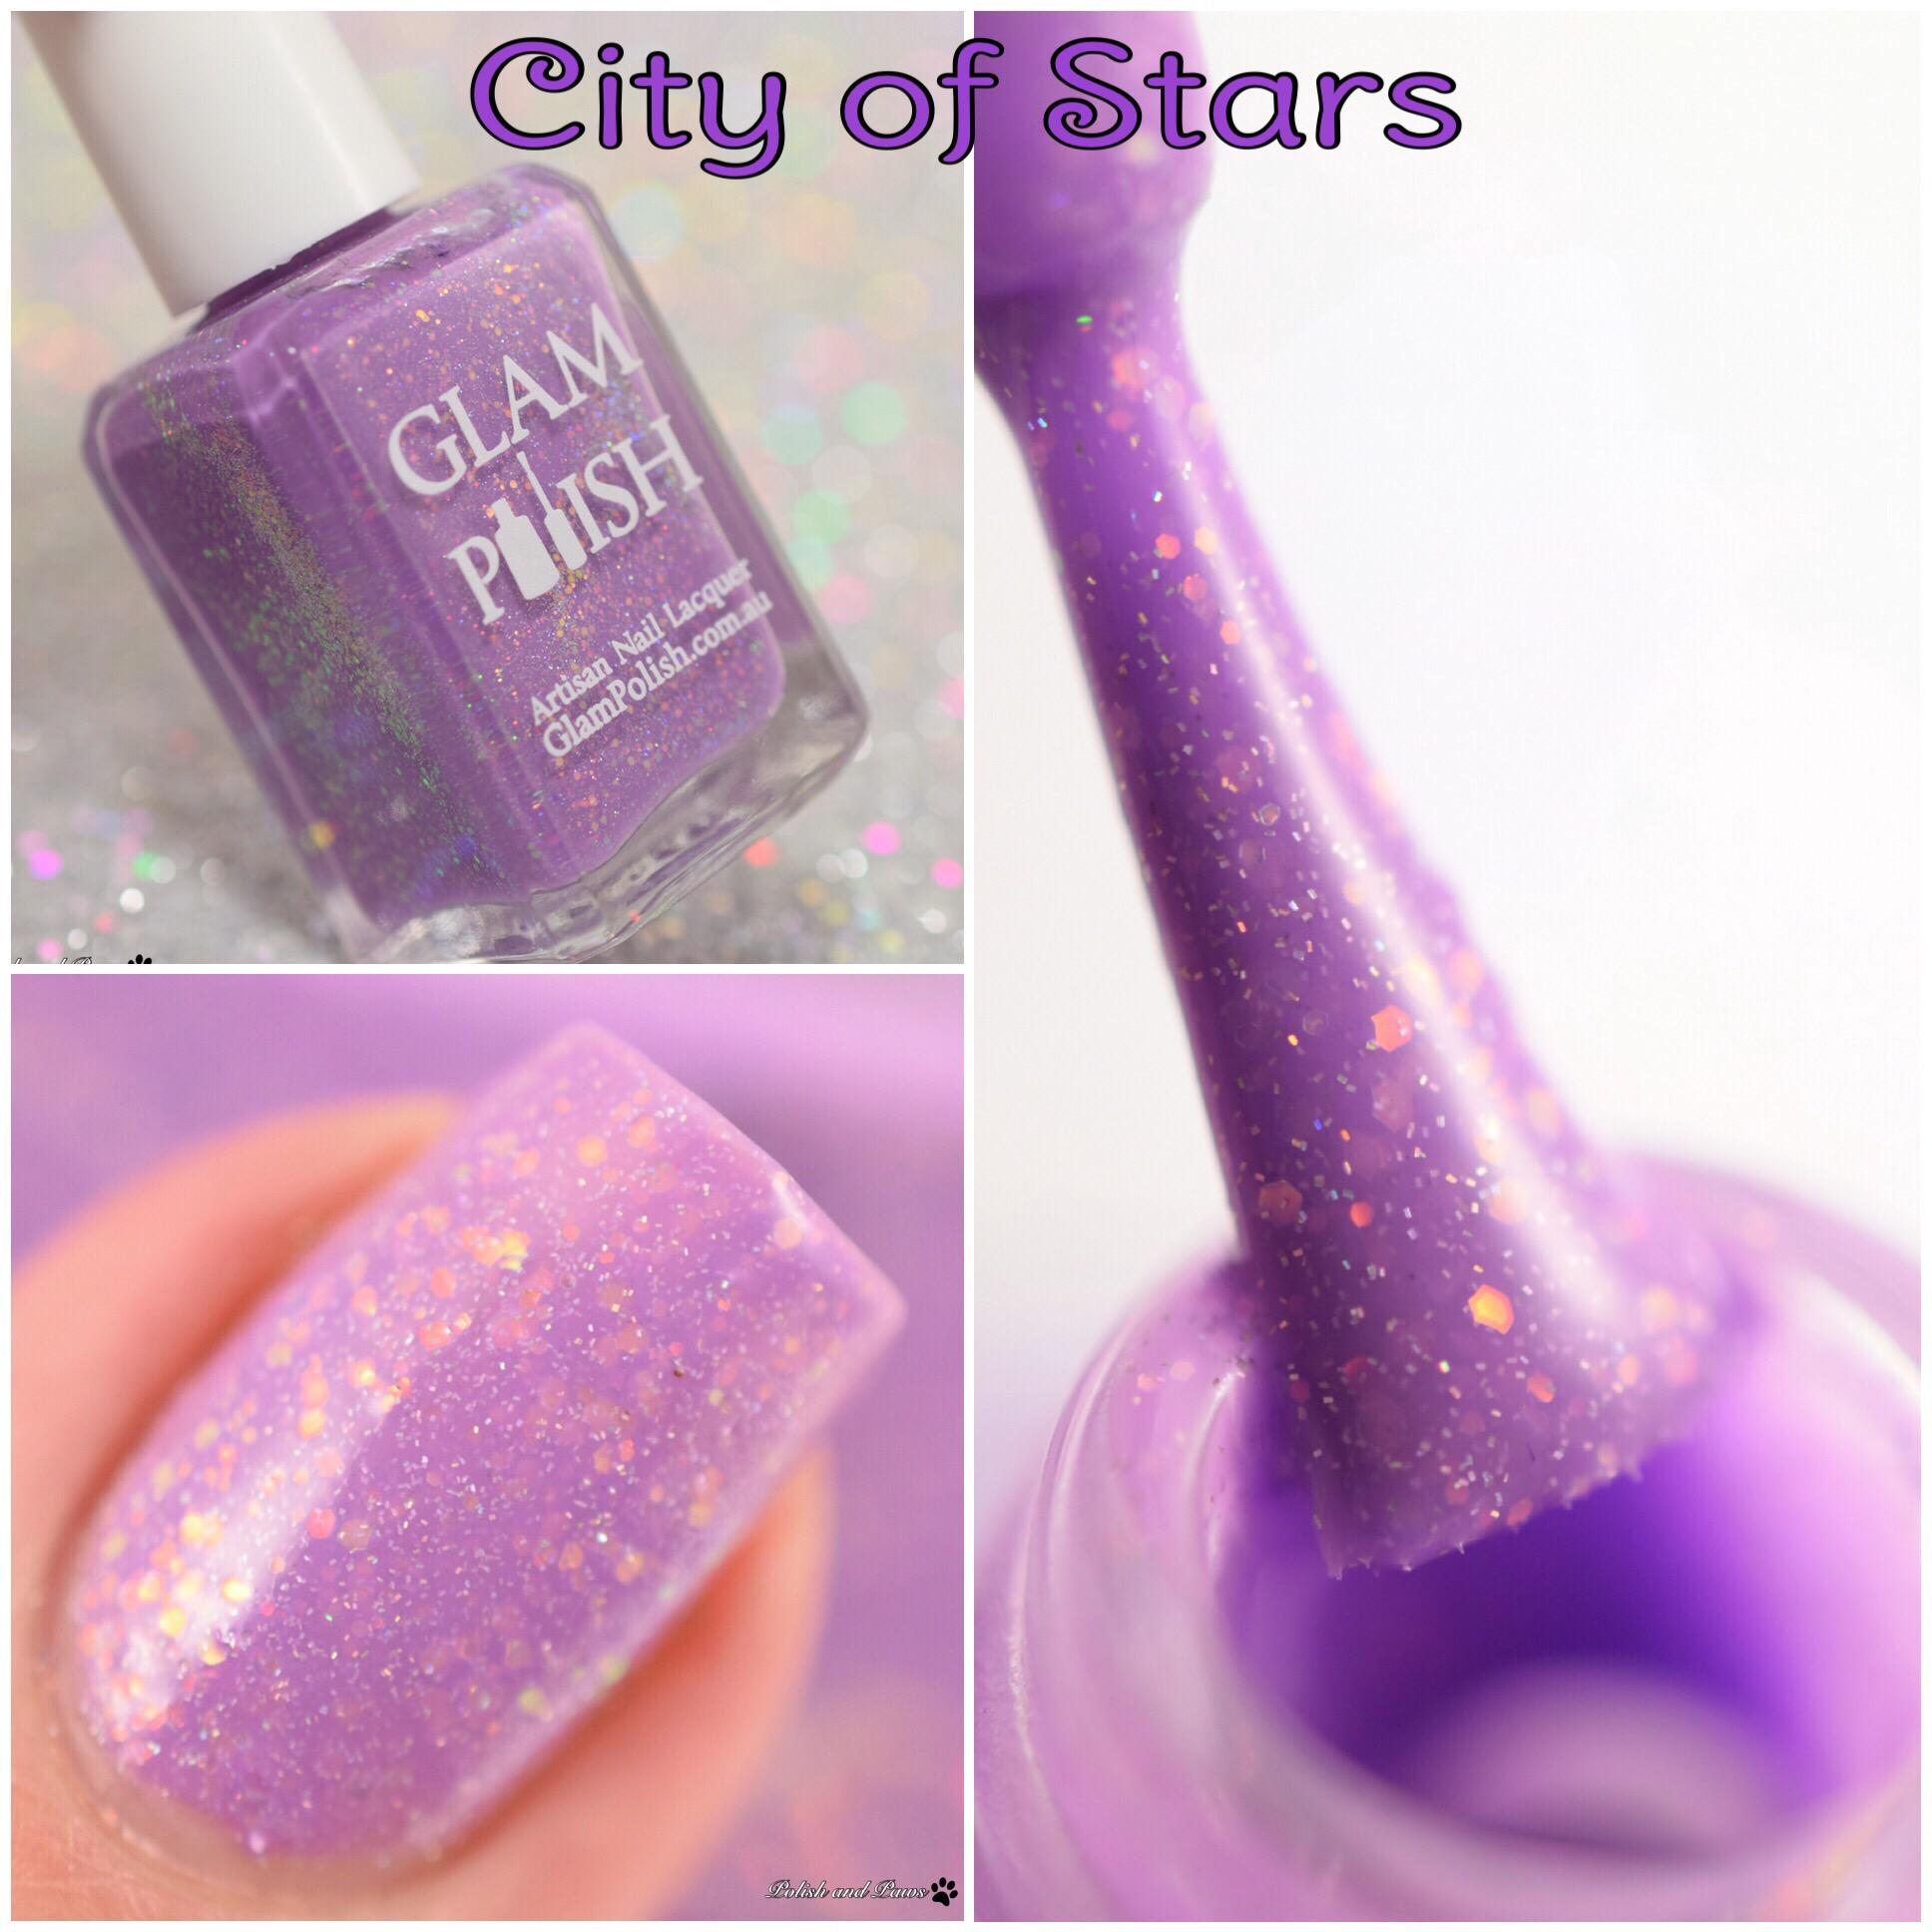 Glam Polish City of Stars